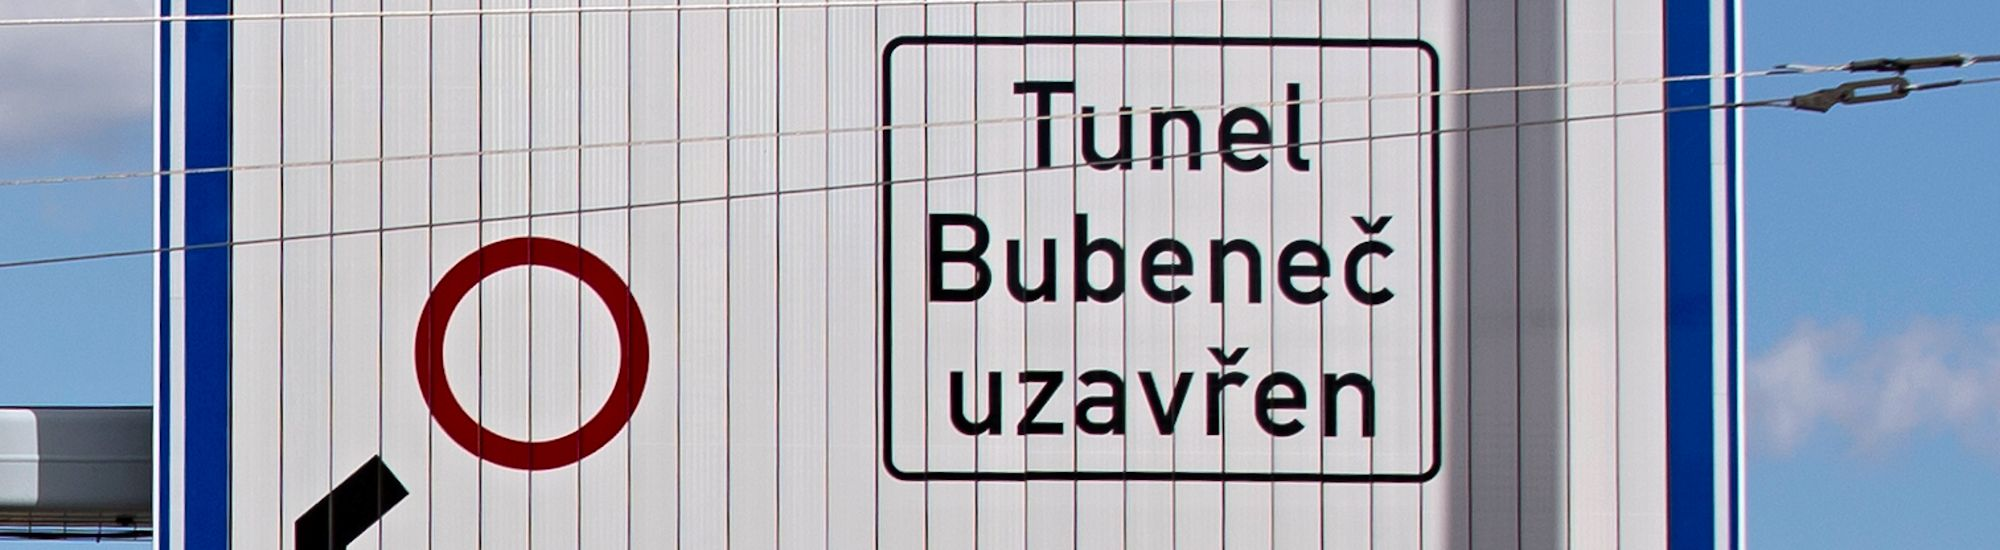 Uzávěra Bubenečského tunelu 17.6.-18.6.2017